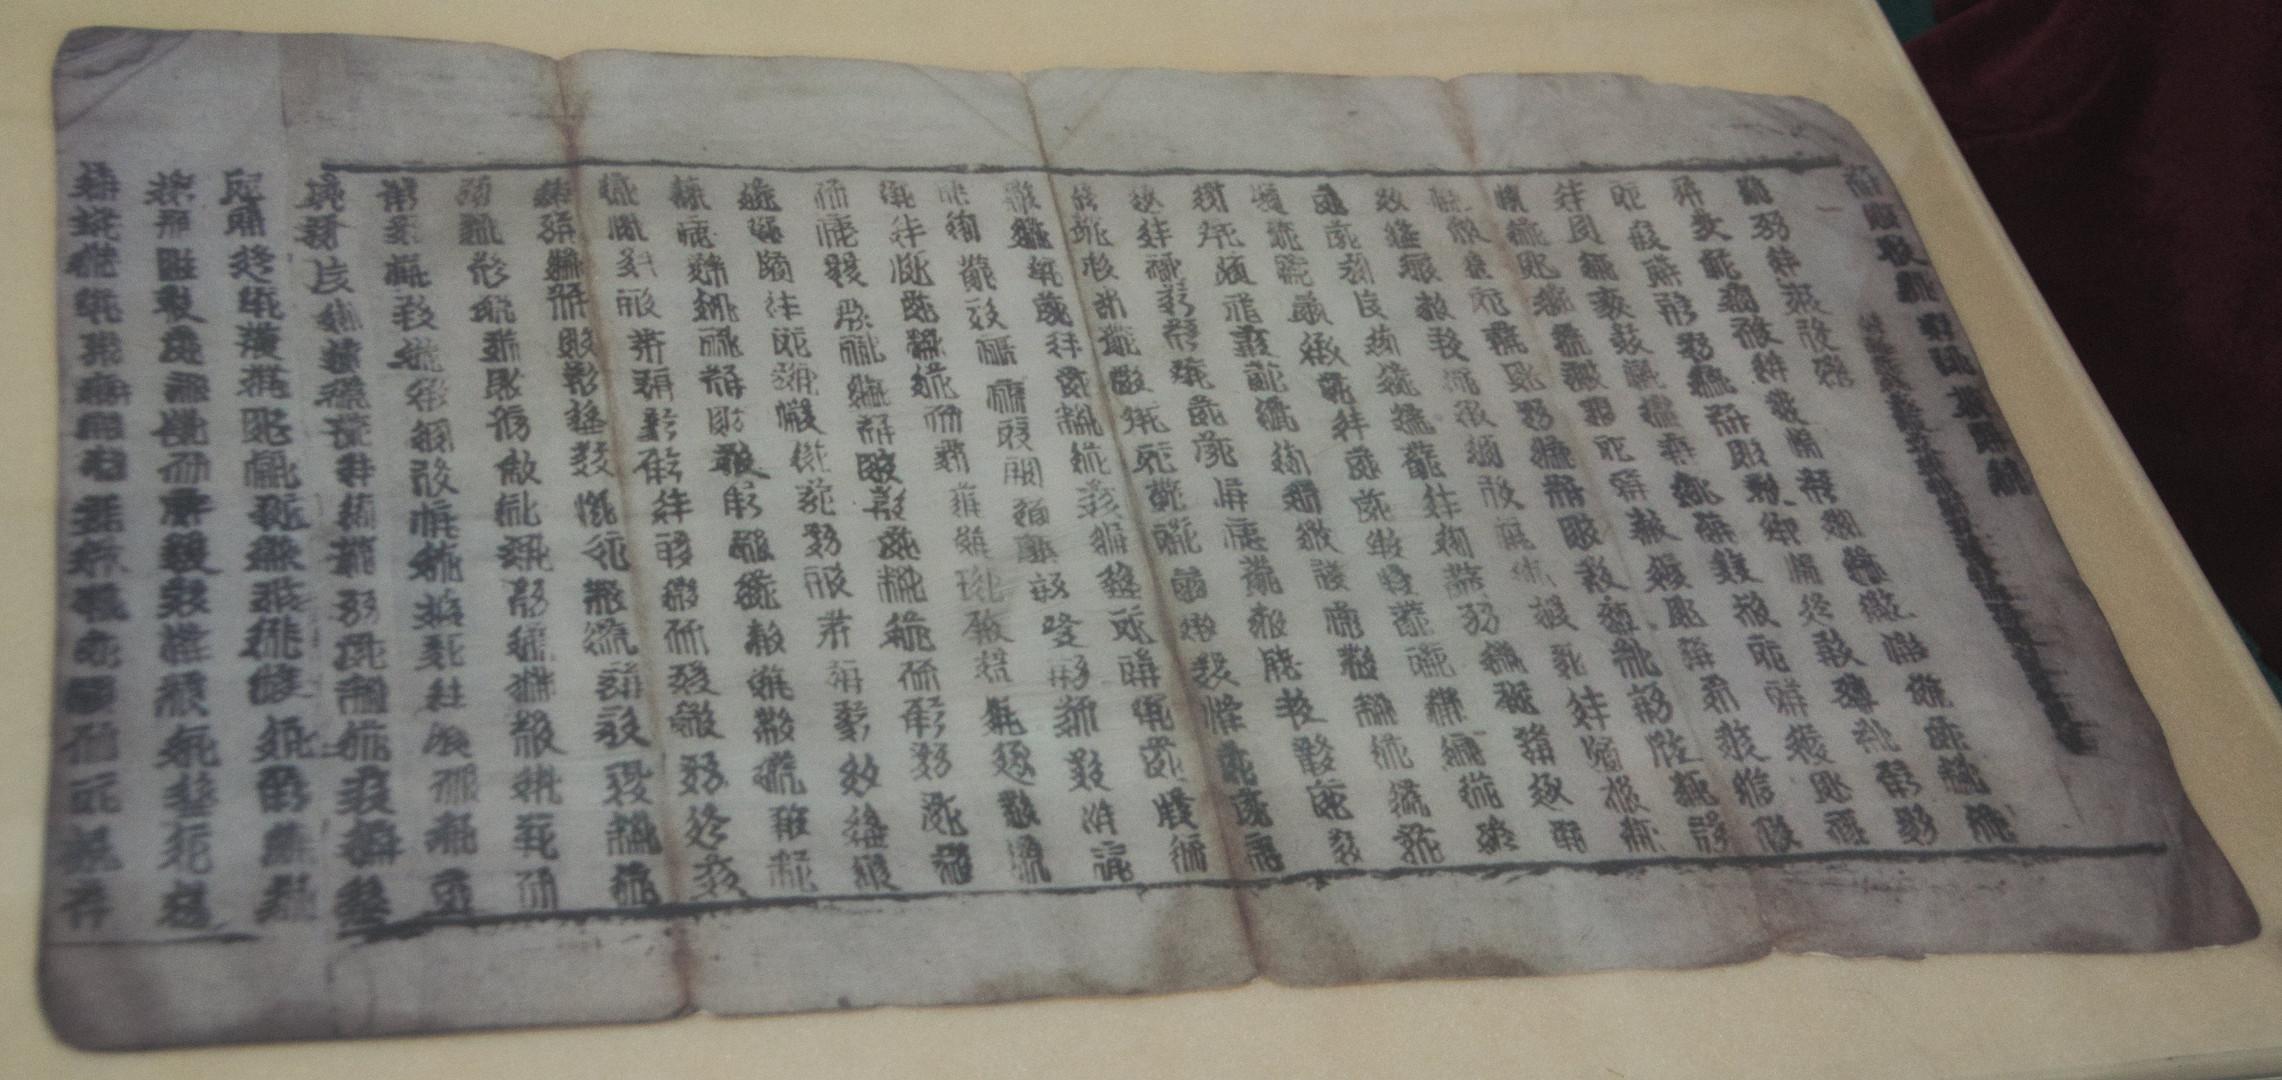 Beijing_printing_museum.12th_century.Xix